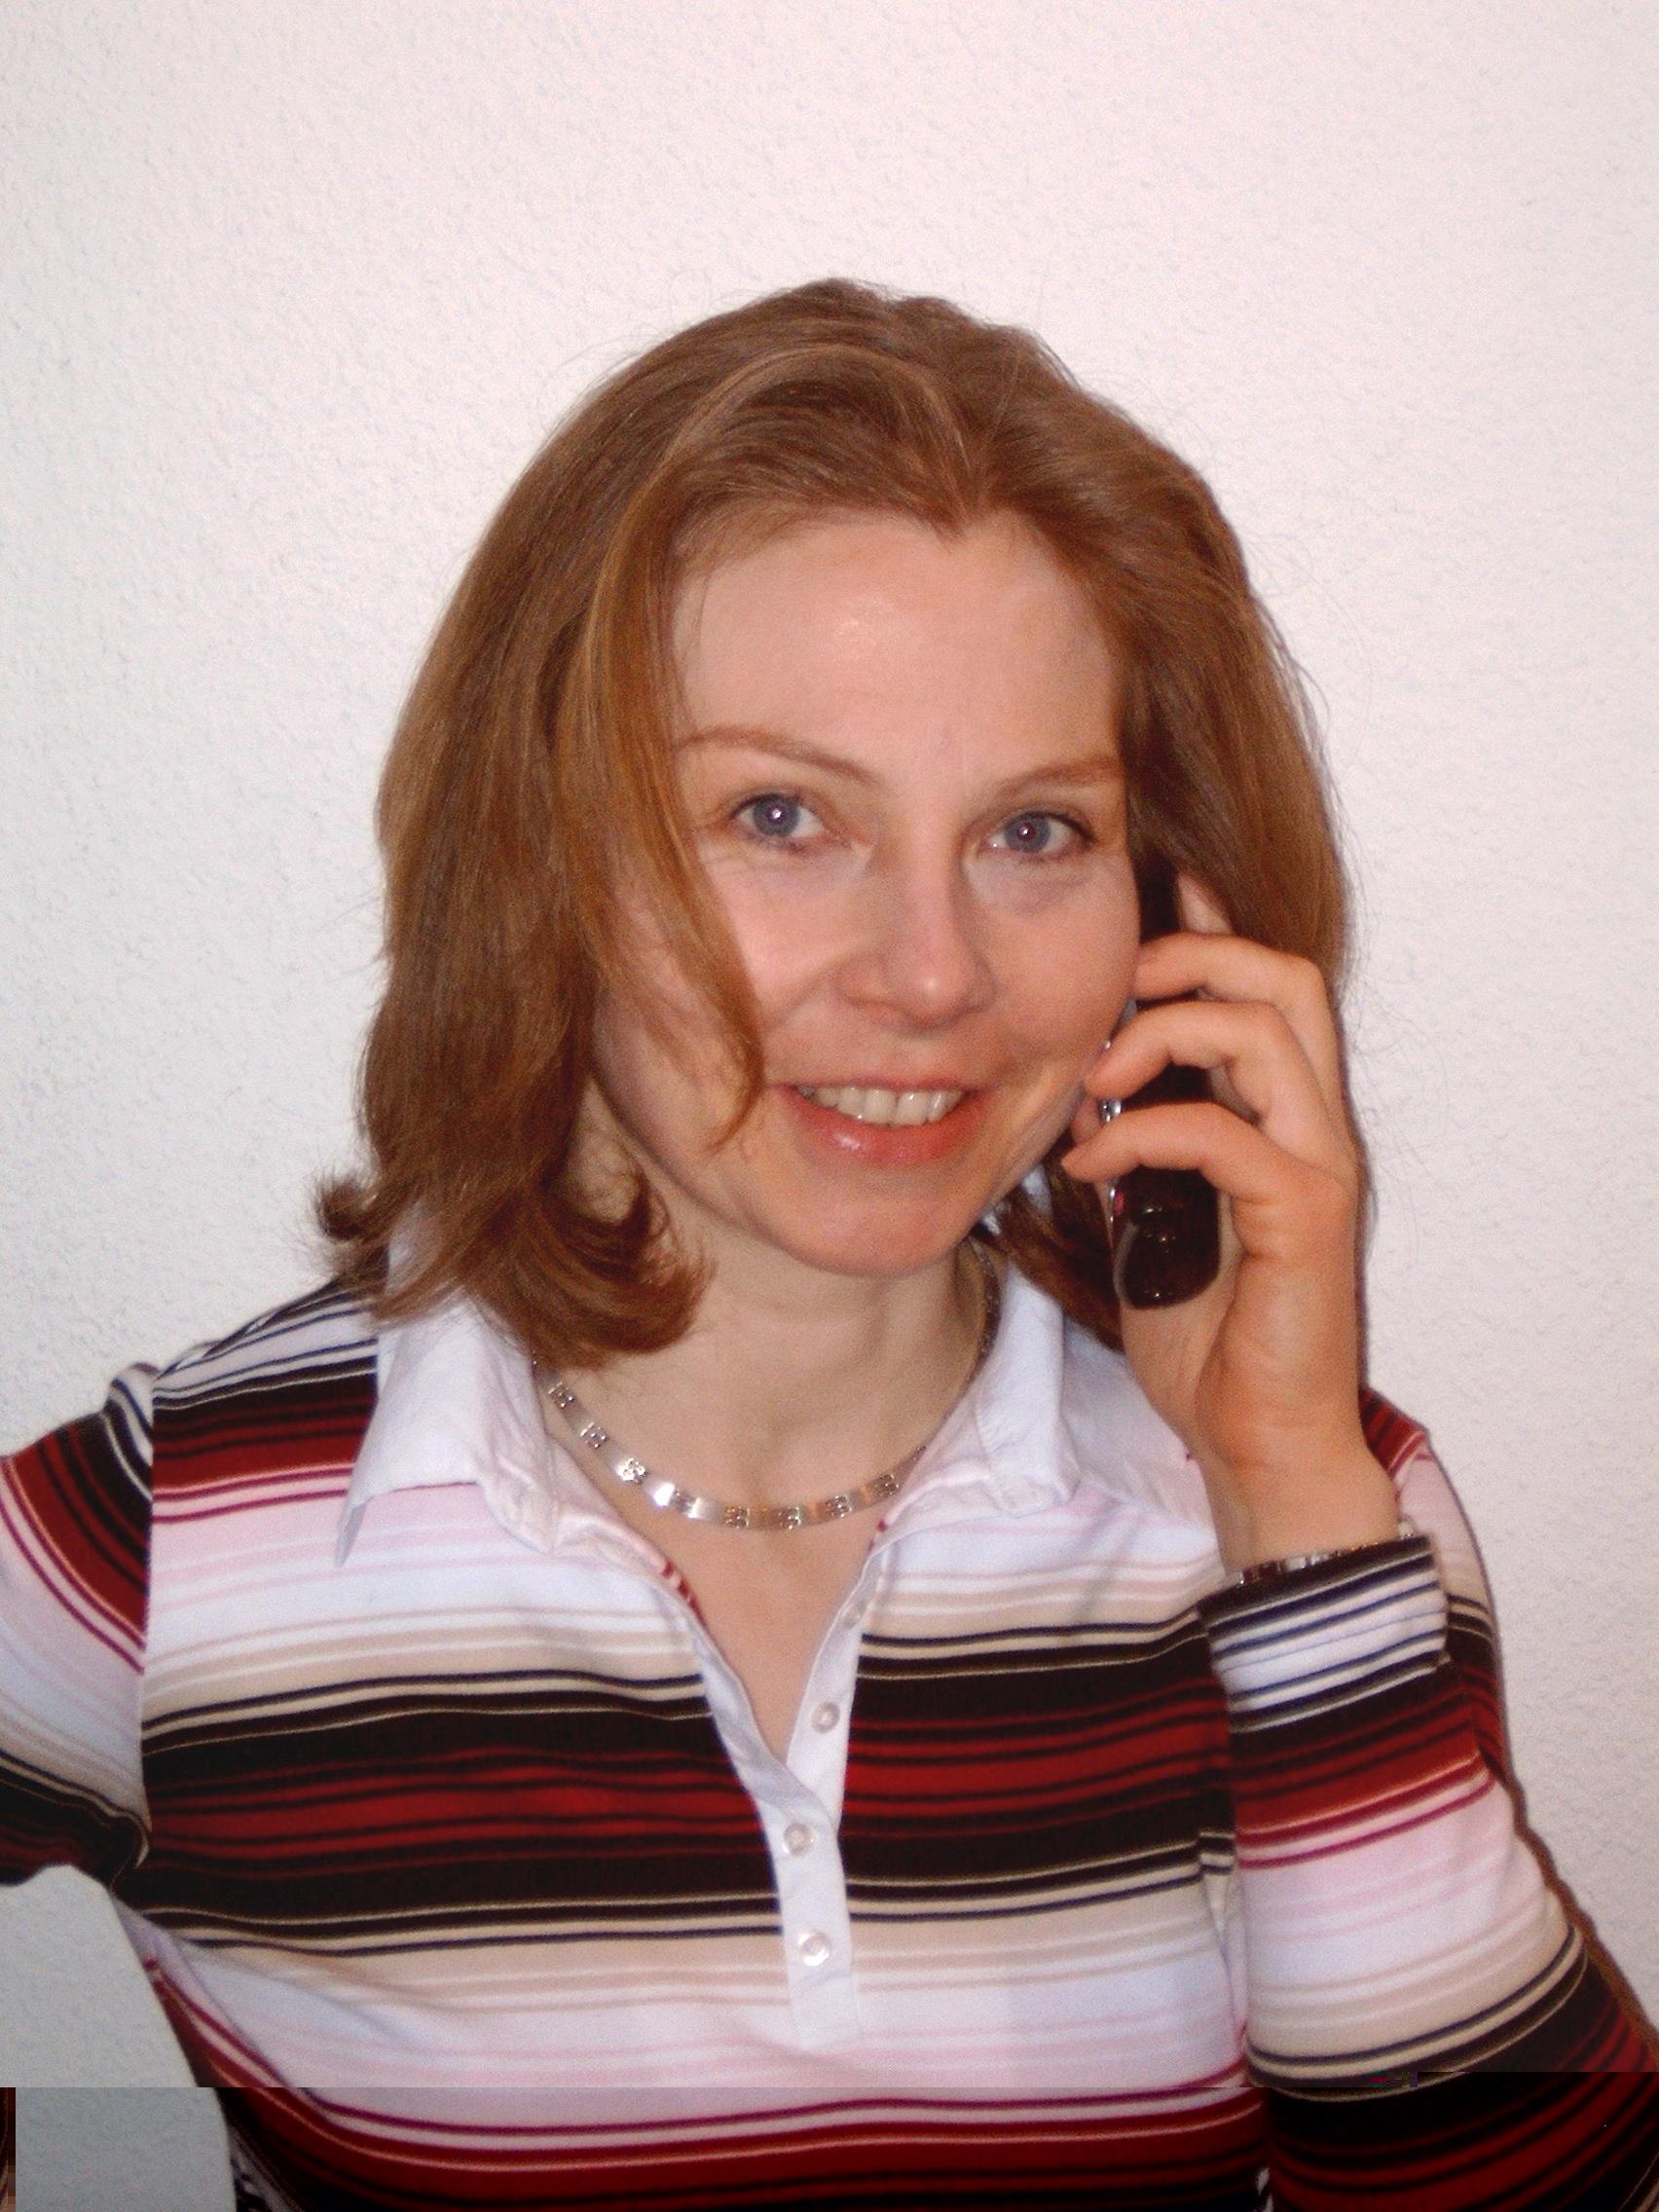 Kerstin Franz